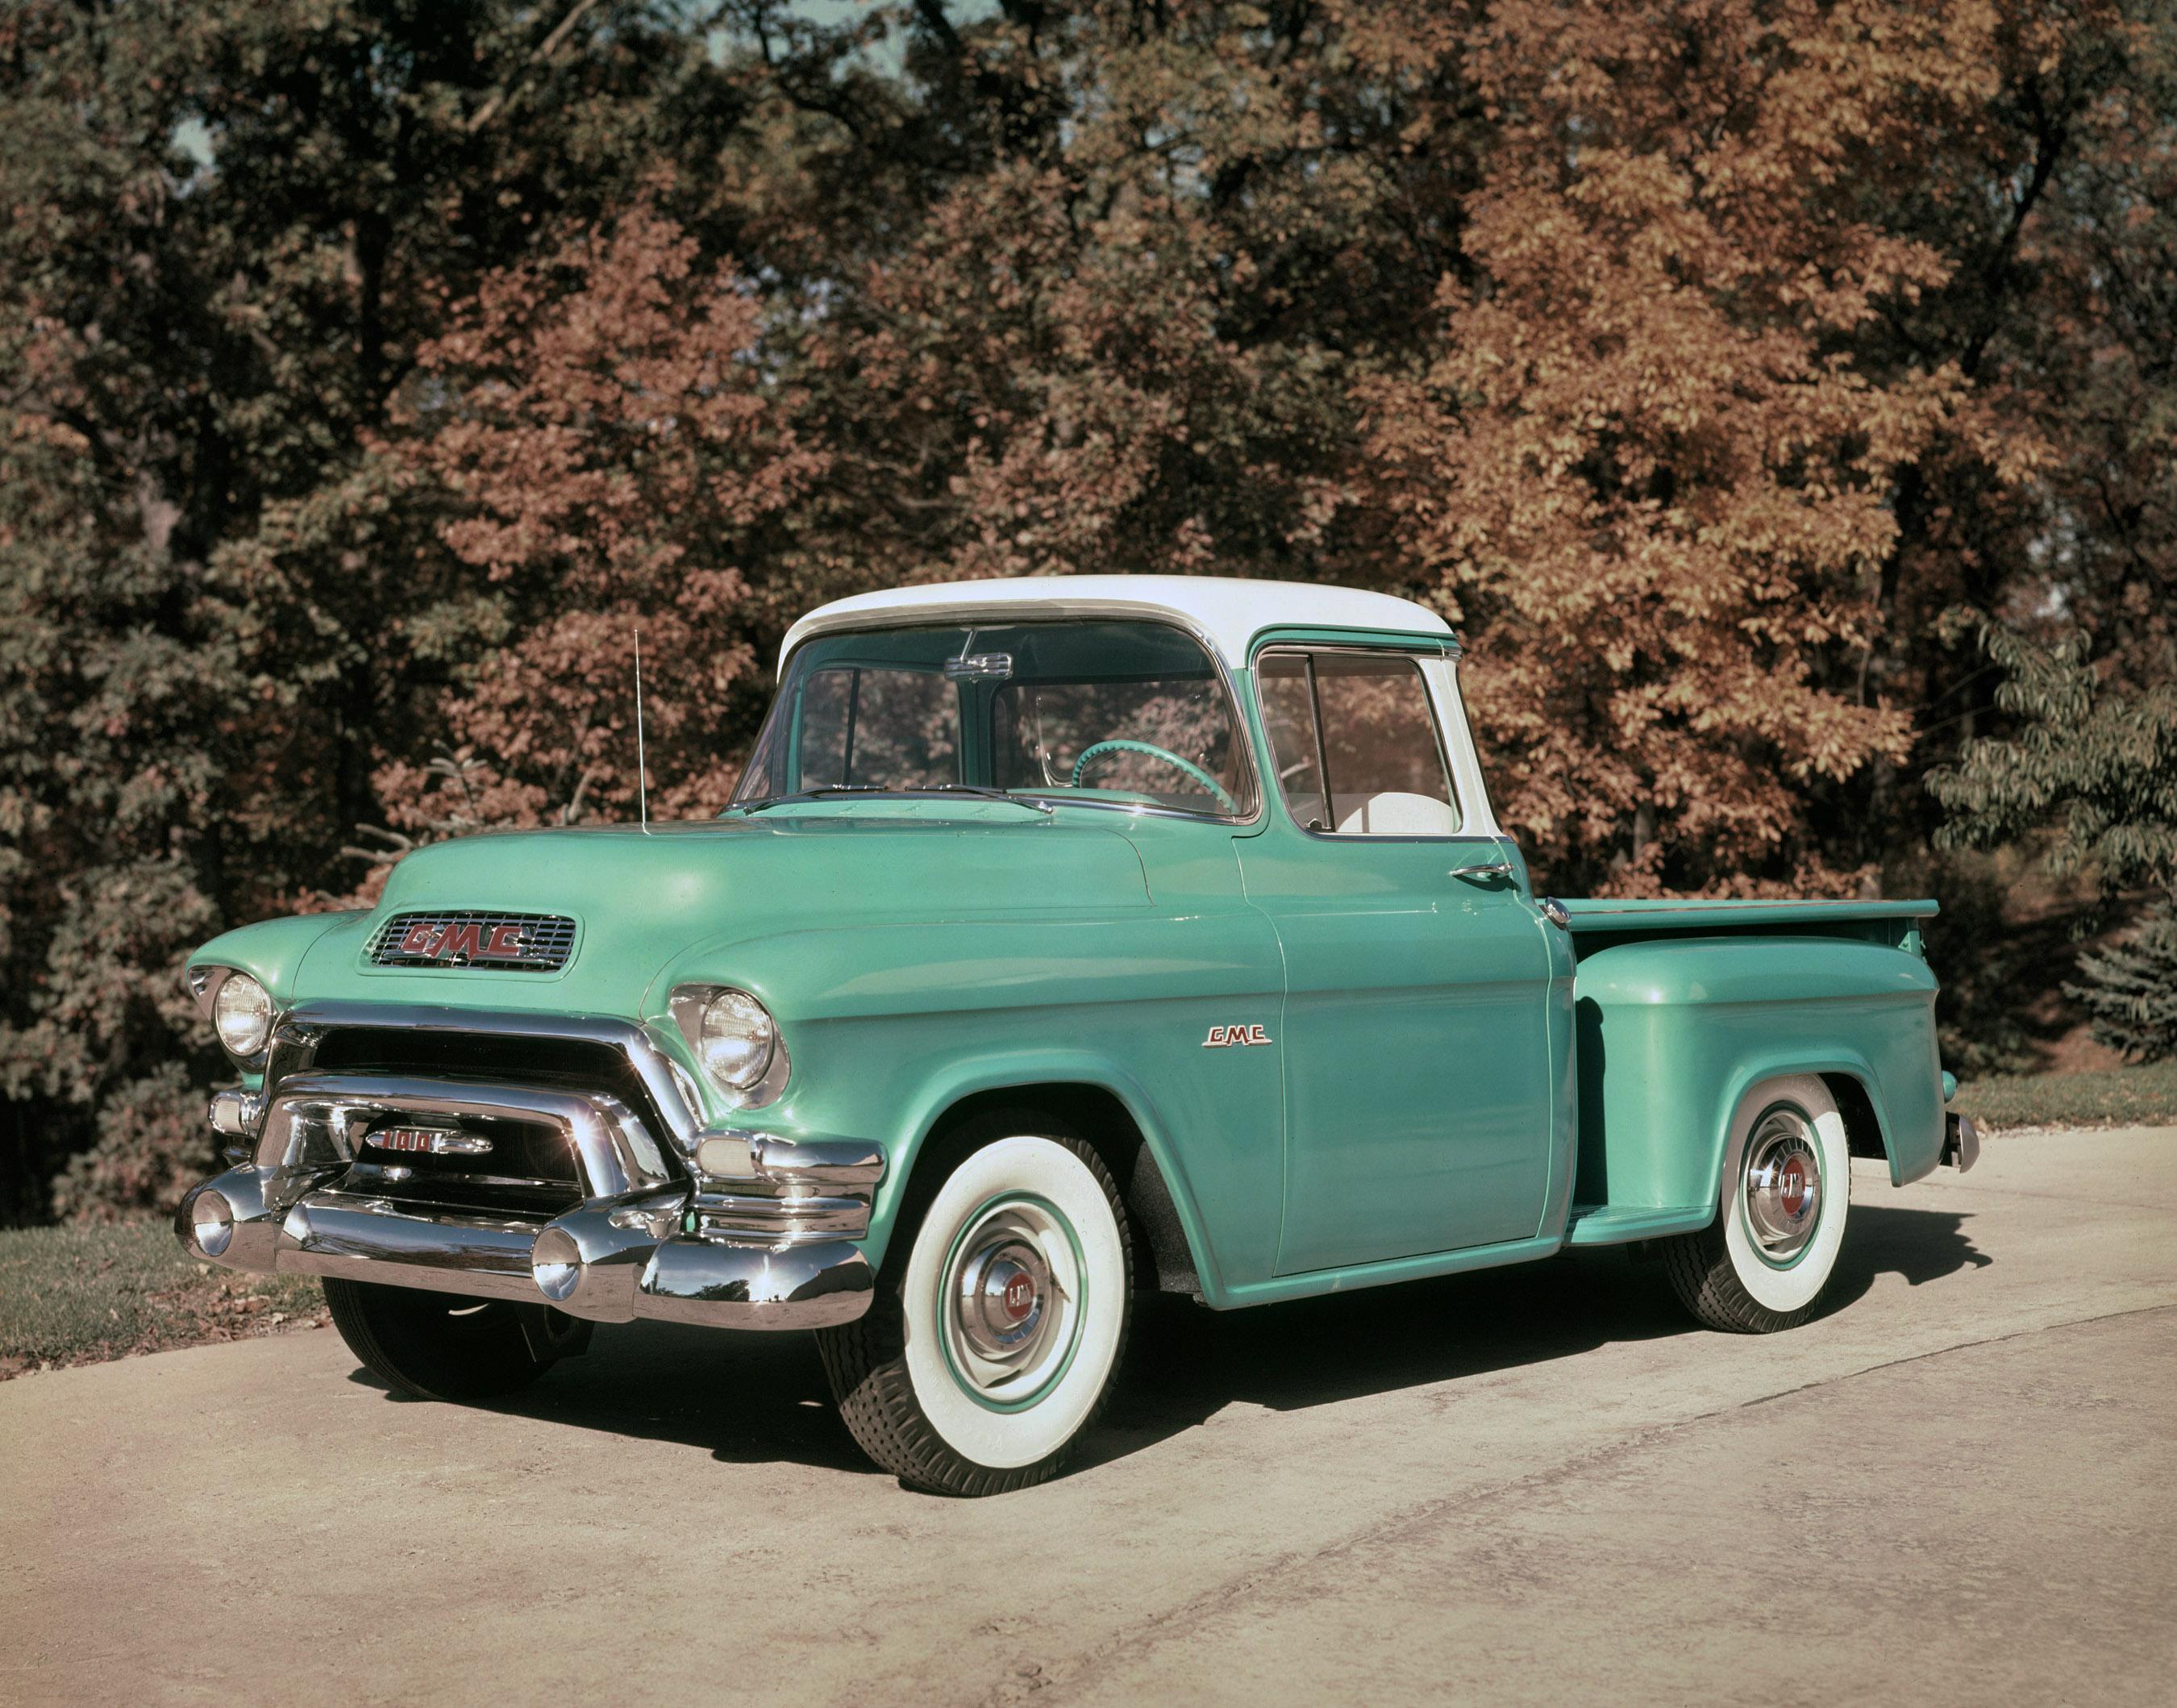 New Sierra Marks 111 Years Of Gmc Pickup Heritage 1958 Chevy Wiring Diagram